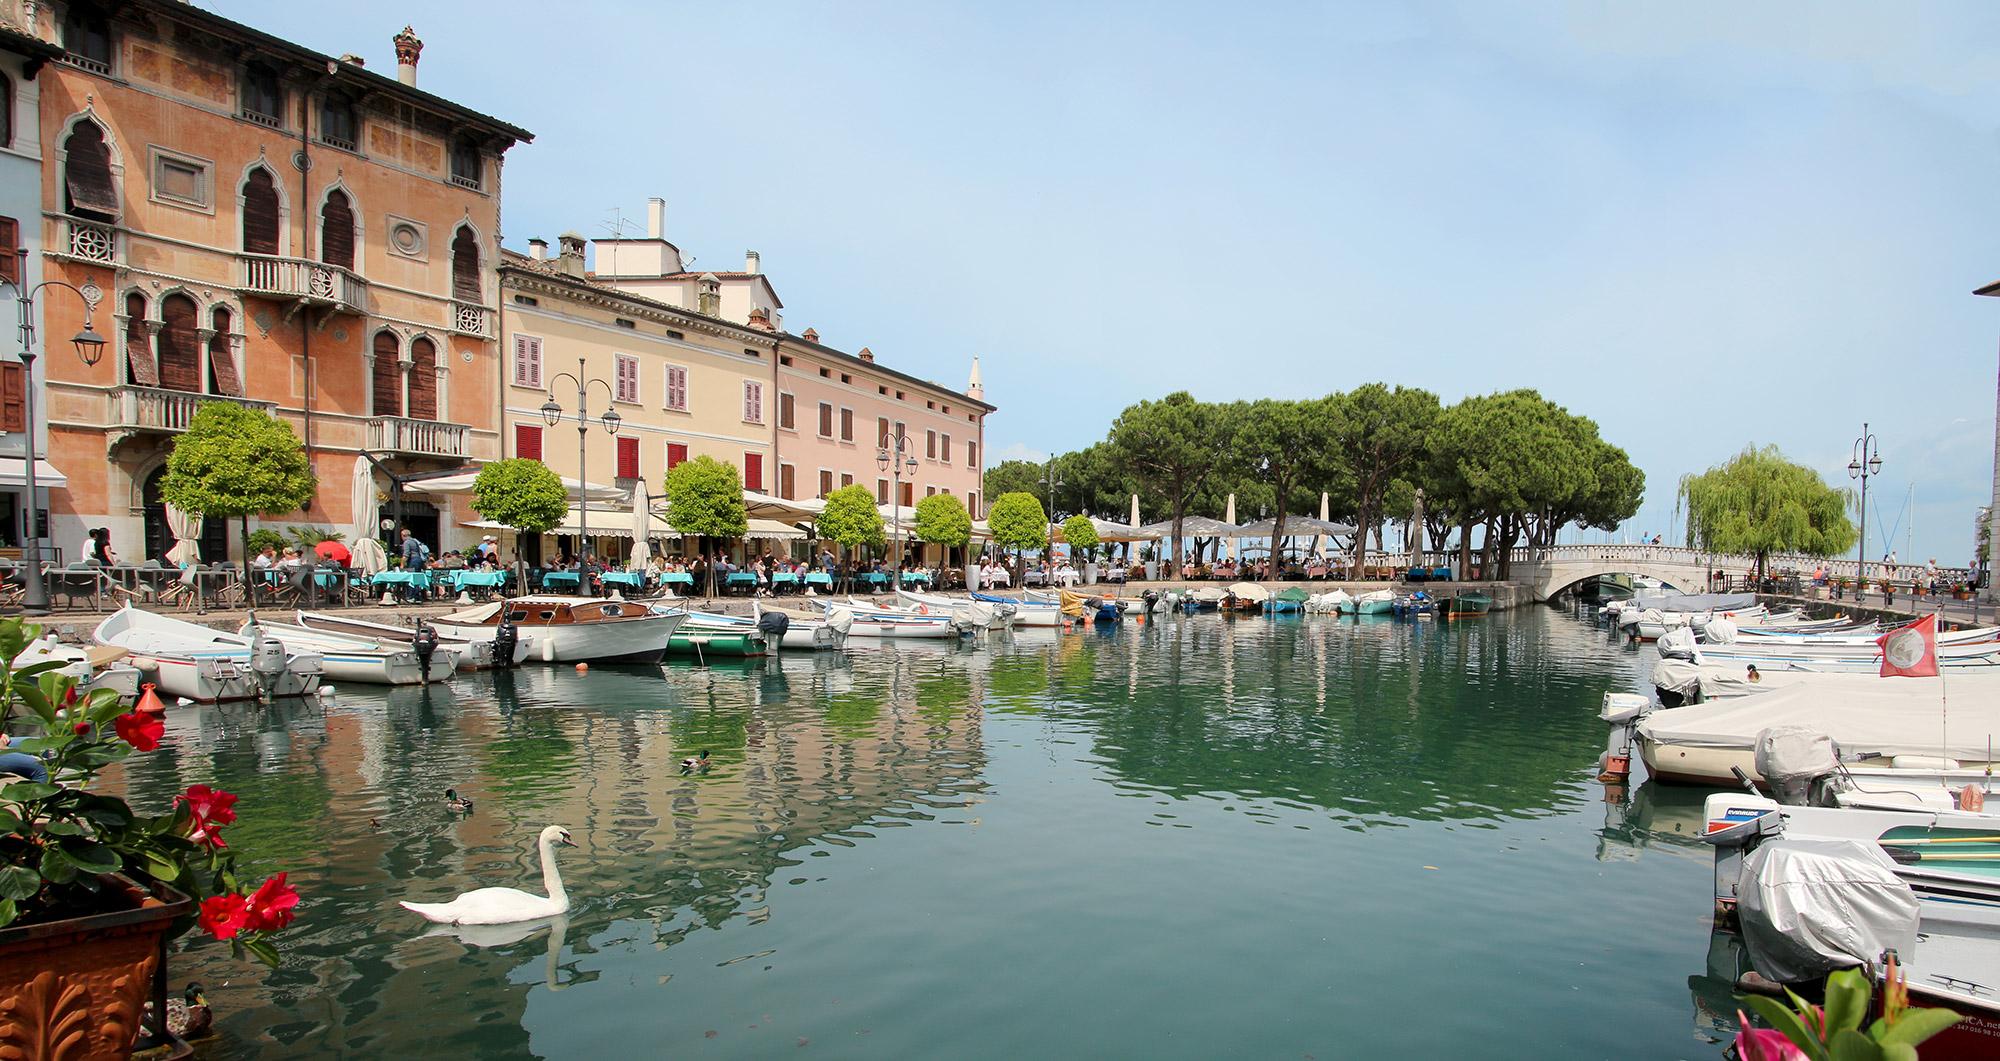 Mijn favoriete reisland, Italië